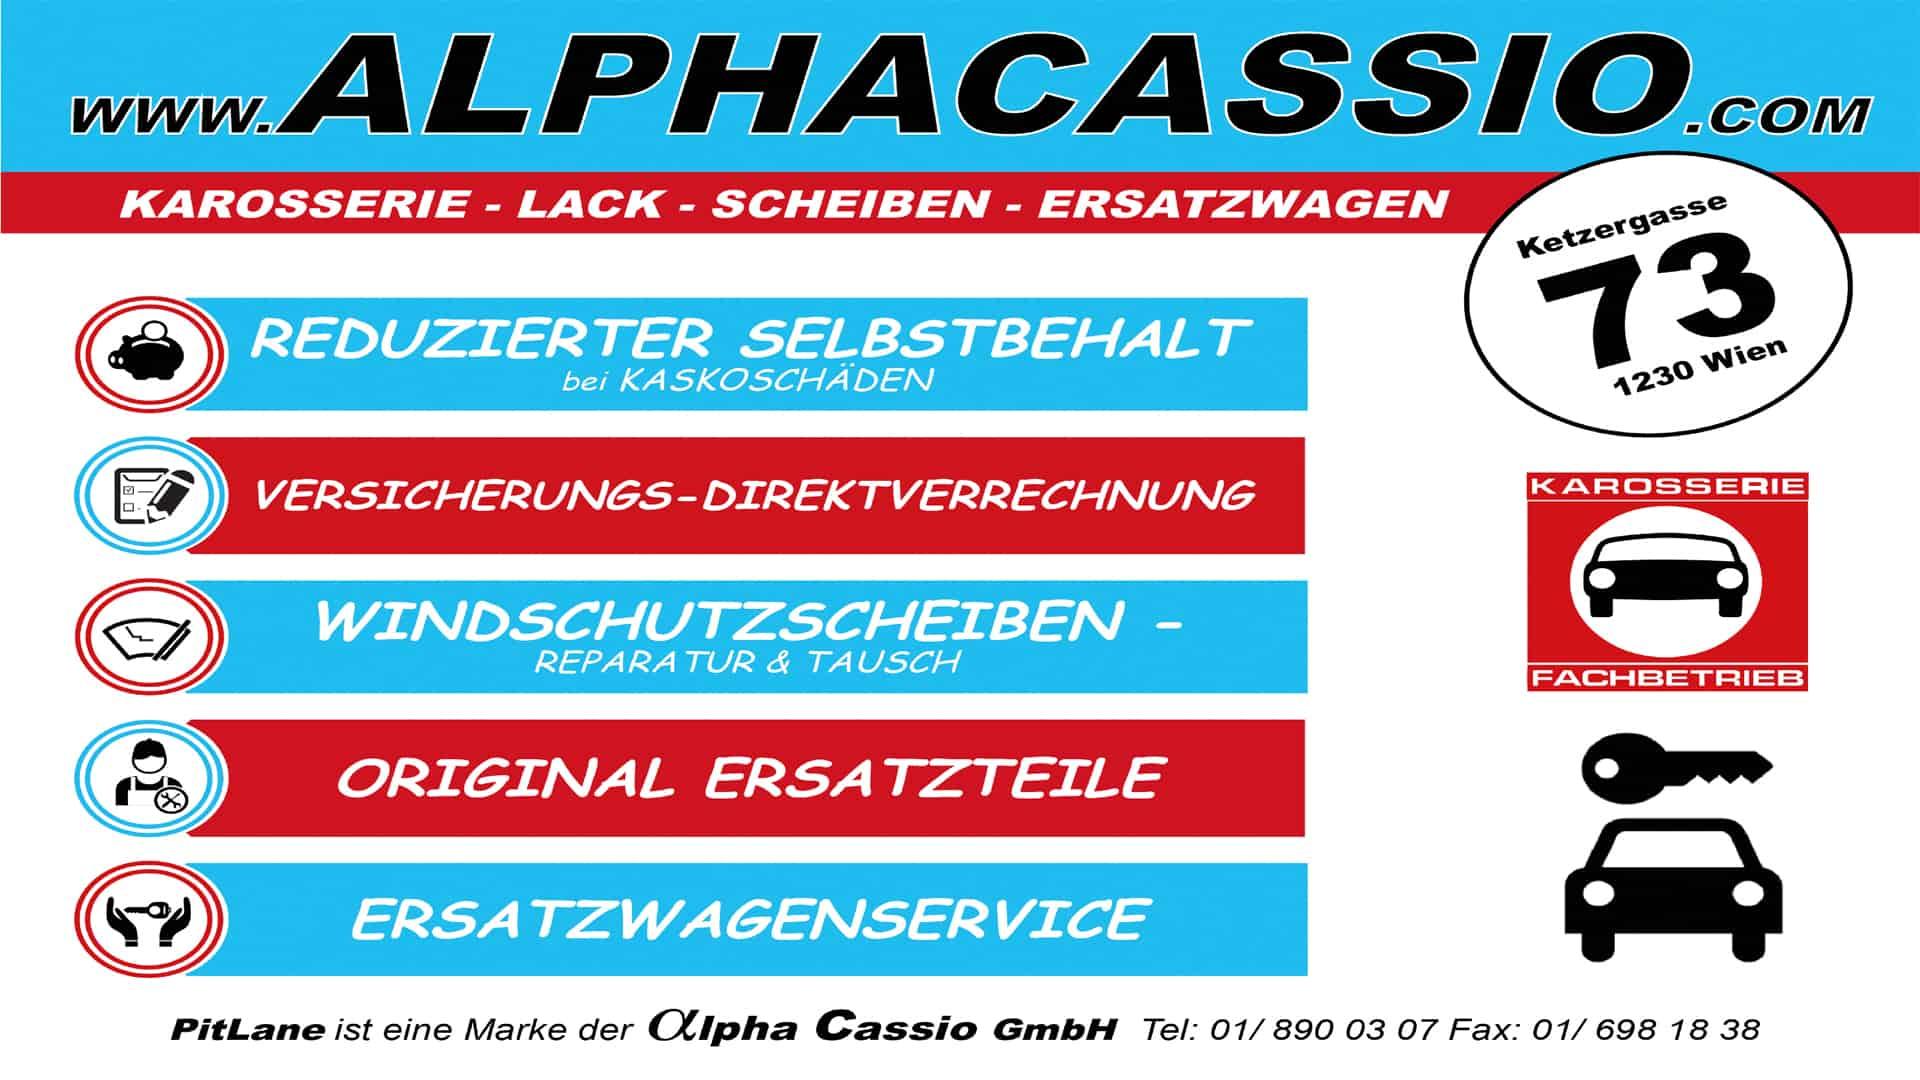 AlphacassioSept21